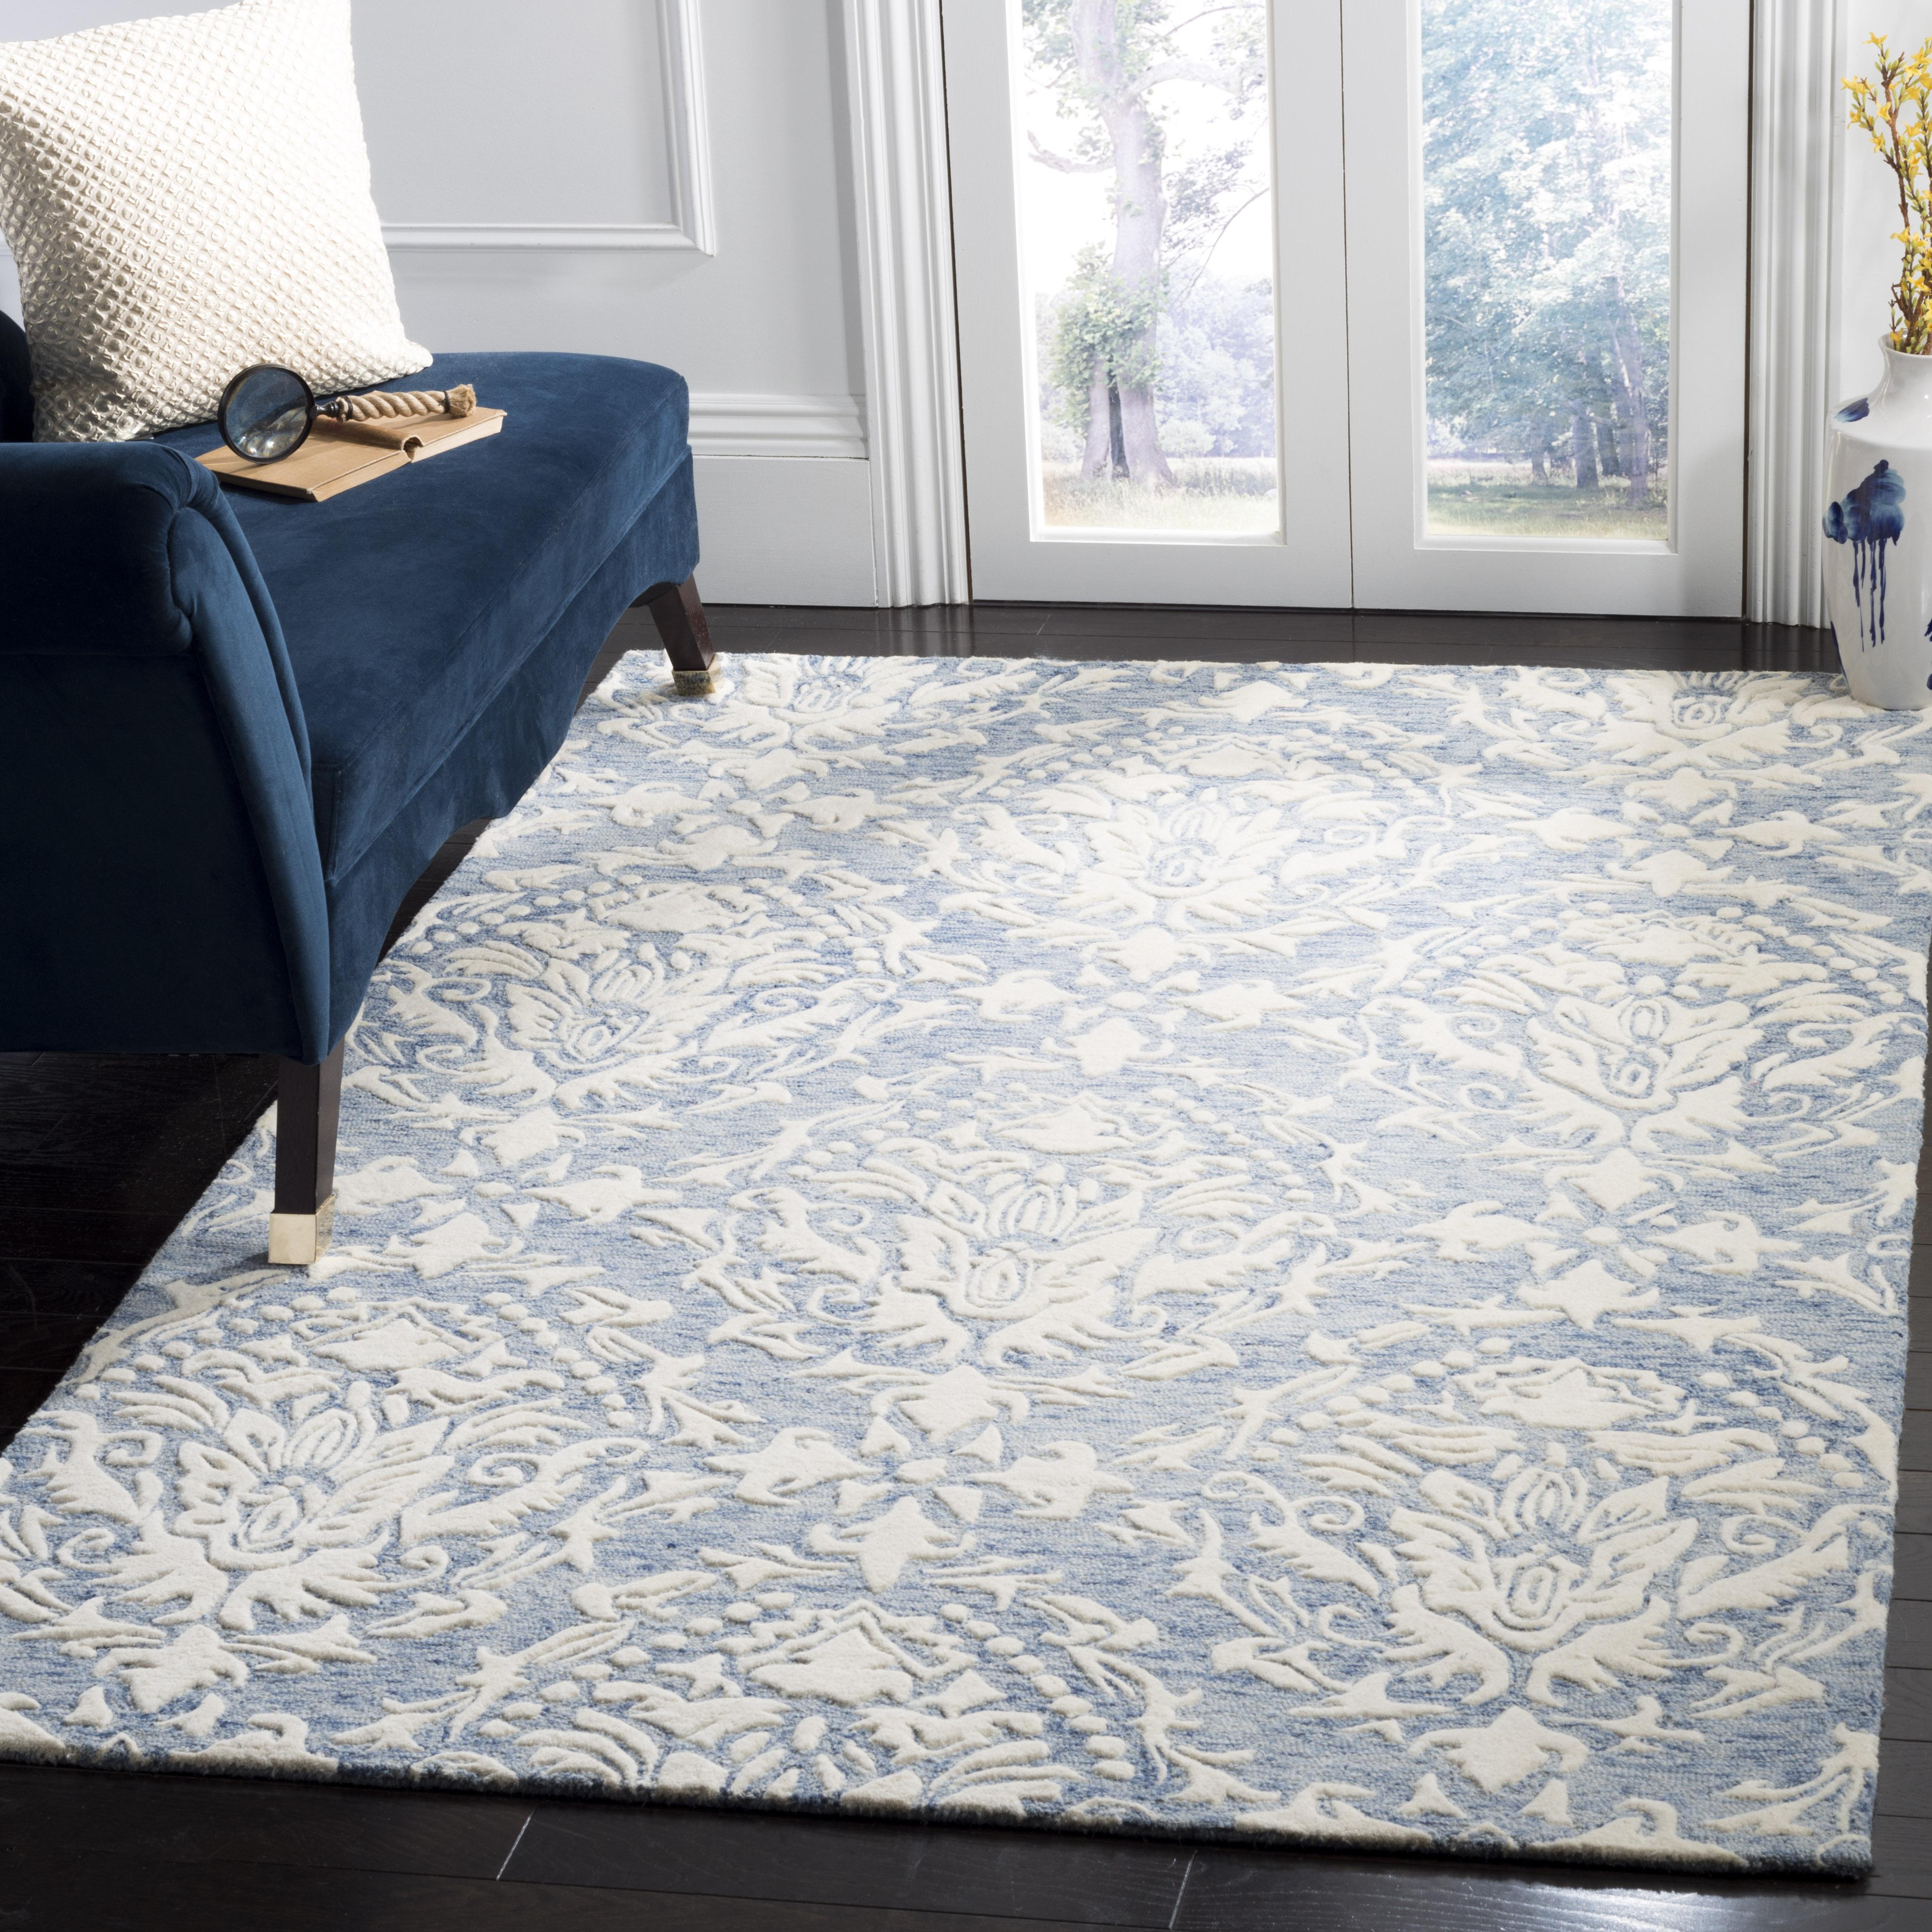 Morgan 107 4' X 6' Blue Wool Rug